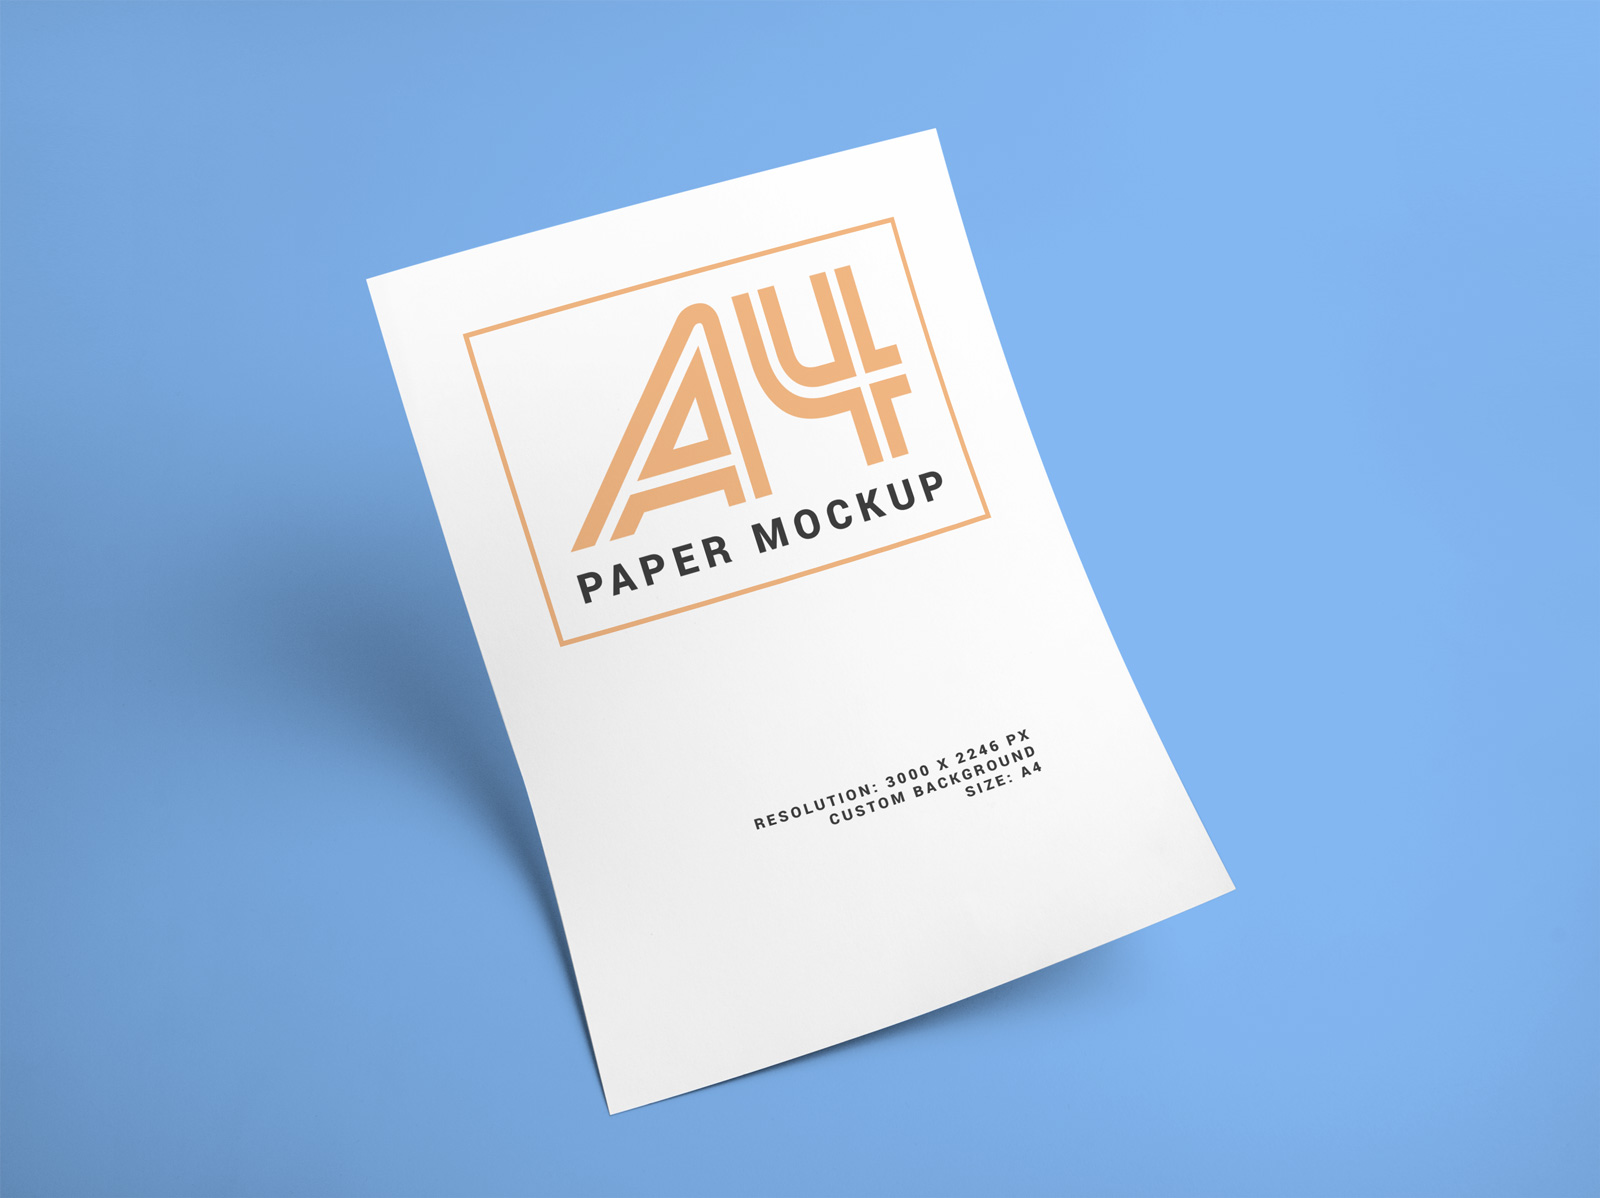 Free-A4-Paper-Mockup-PSD